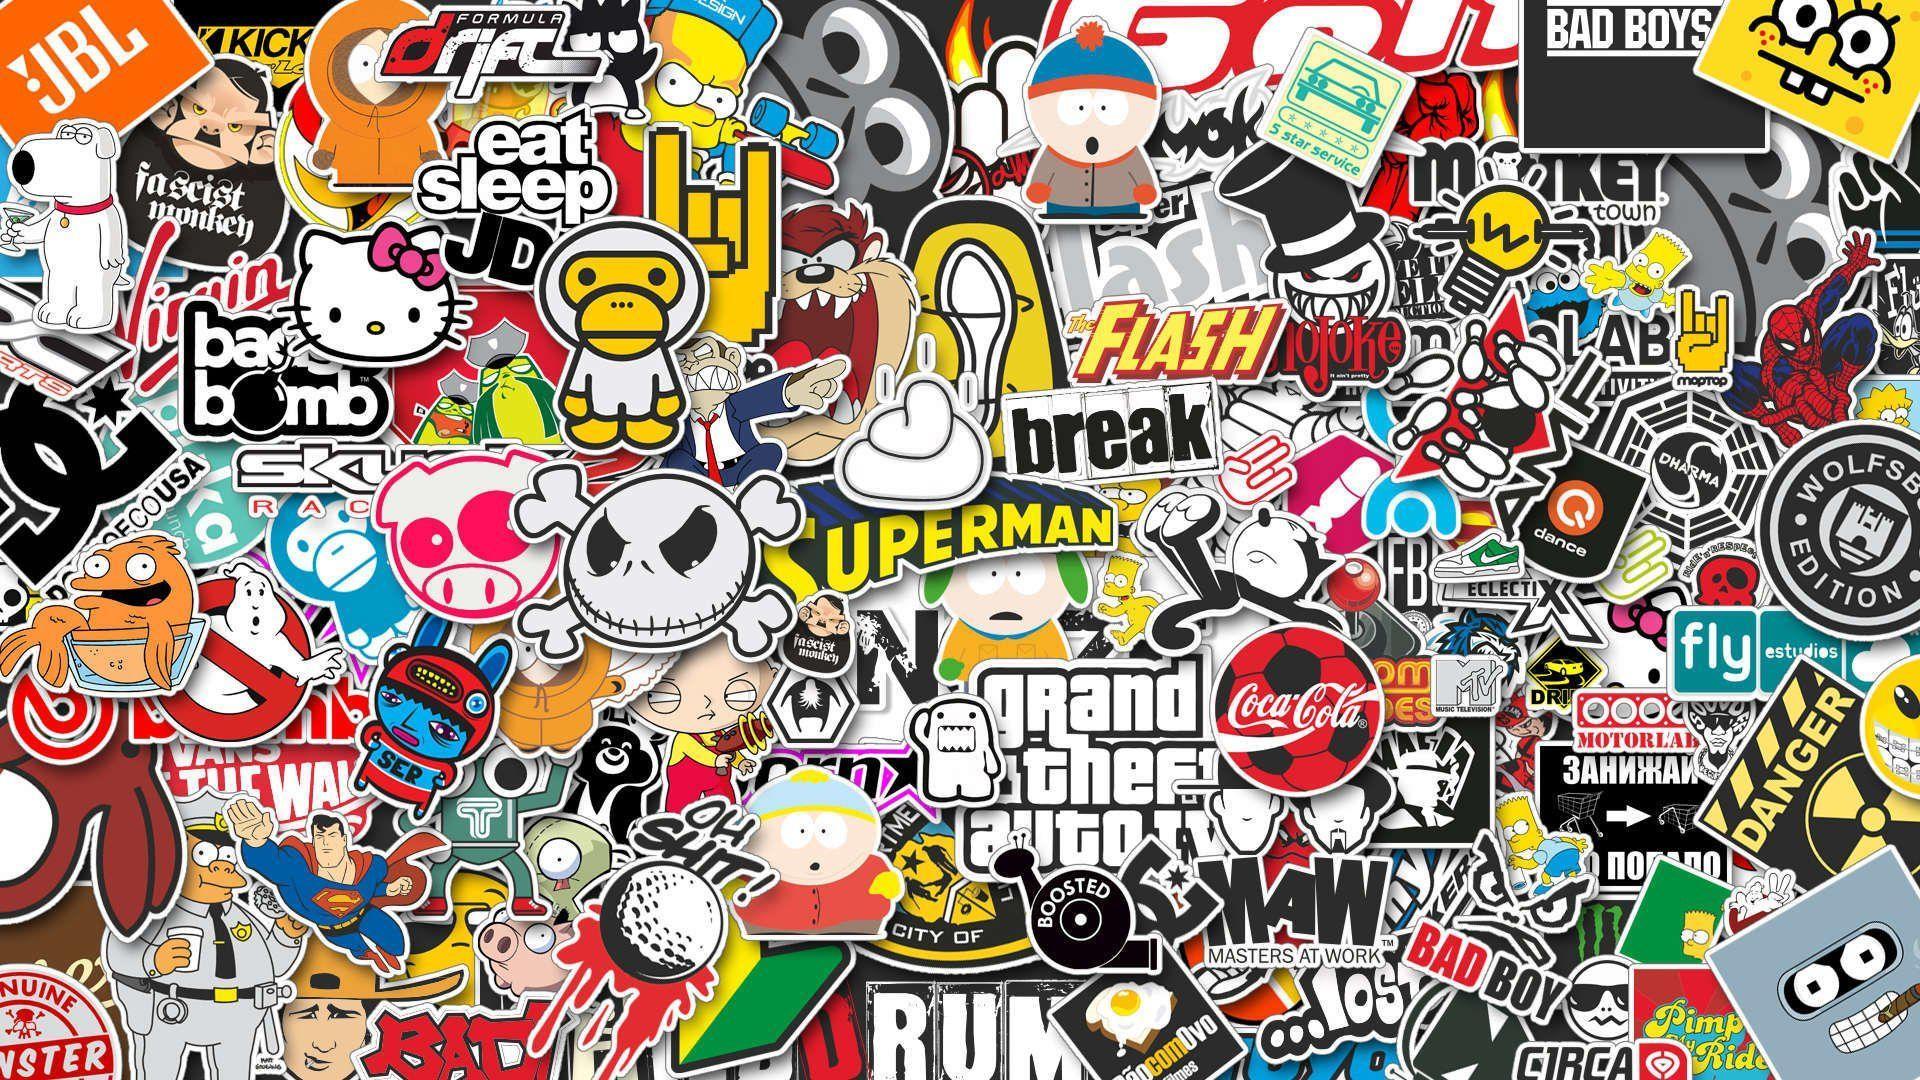 10 Sticker Bomb HD Wallpapers